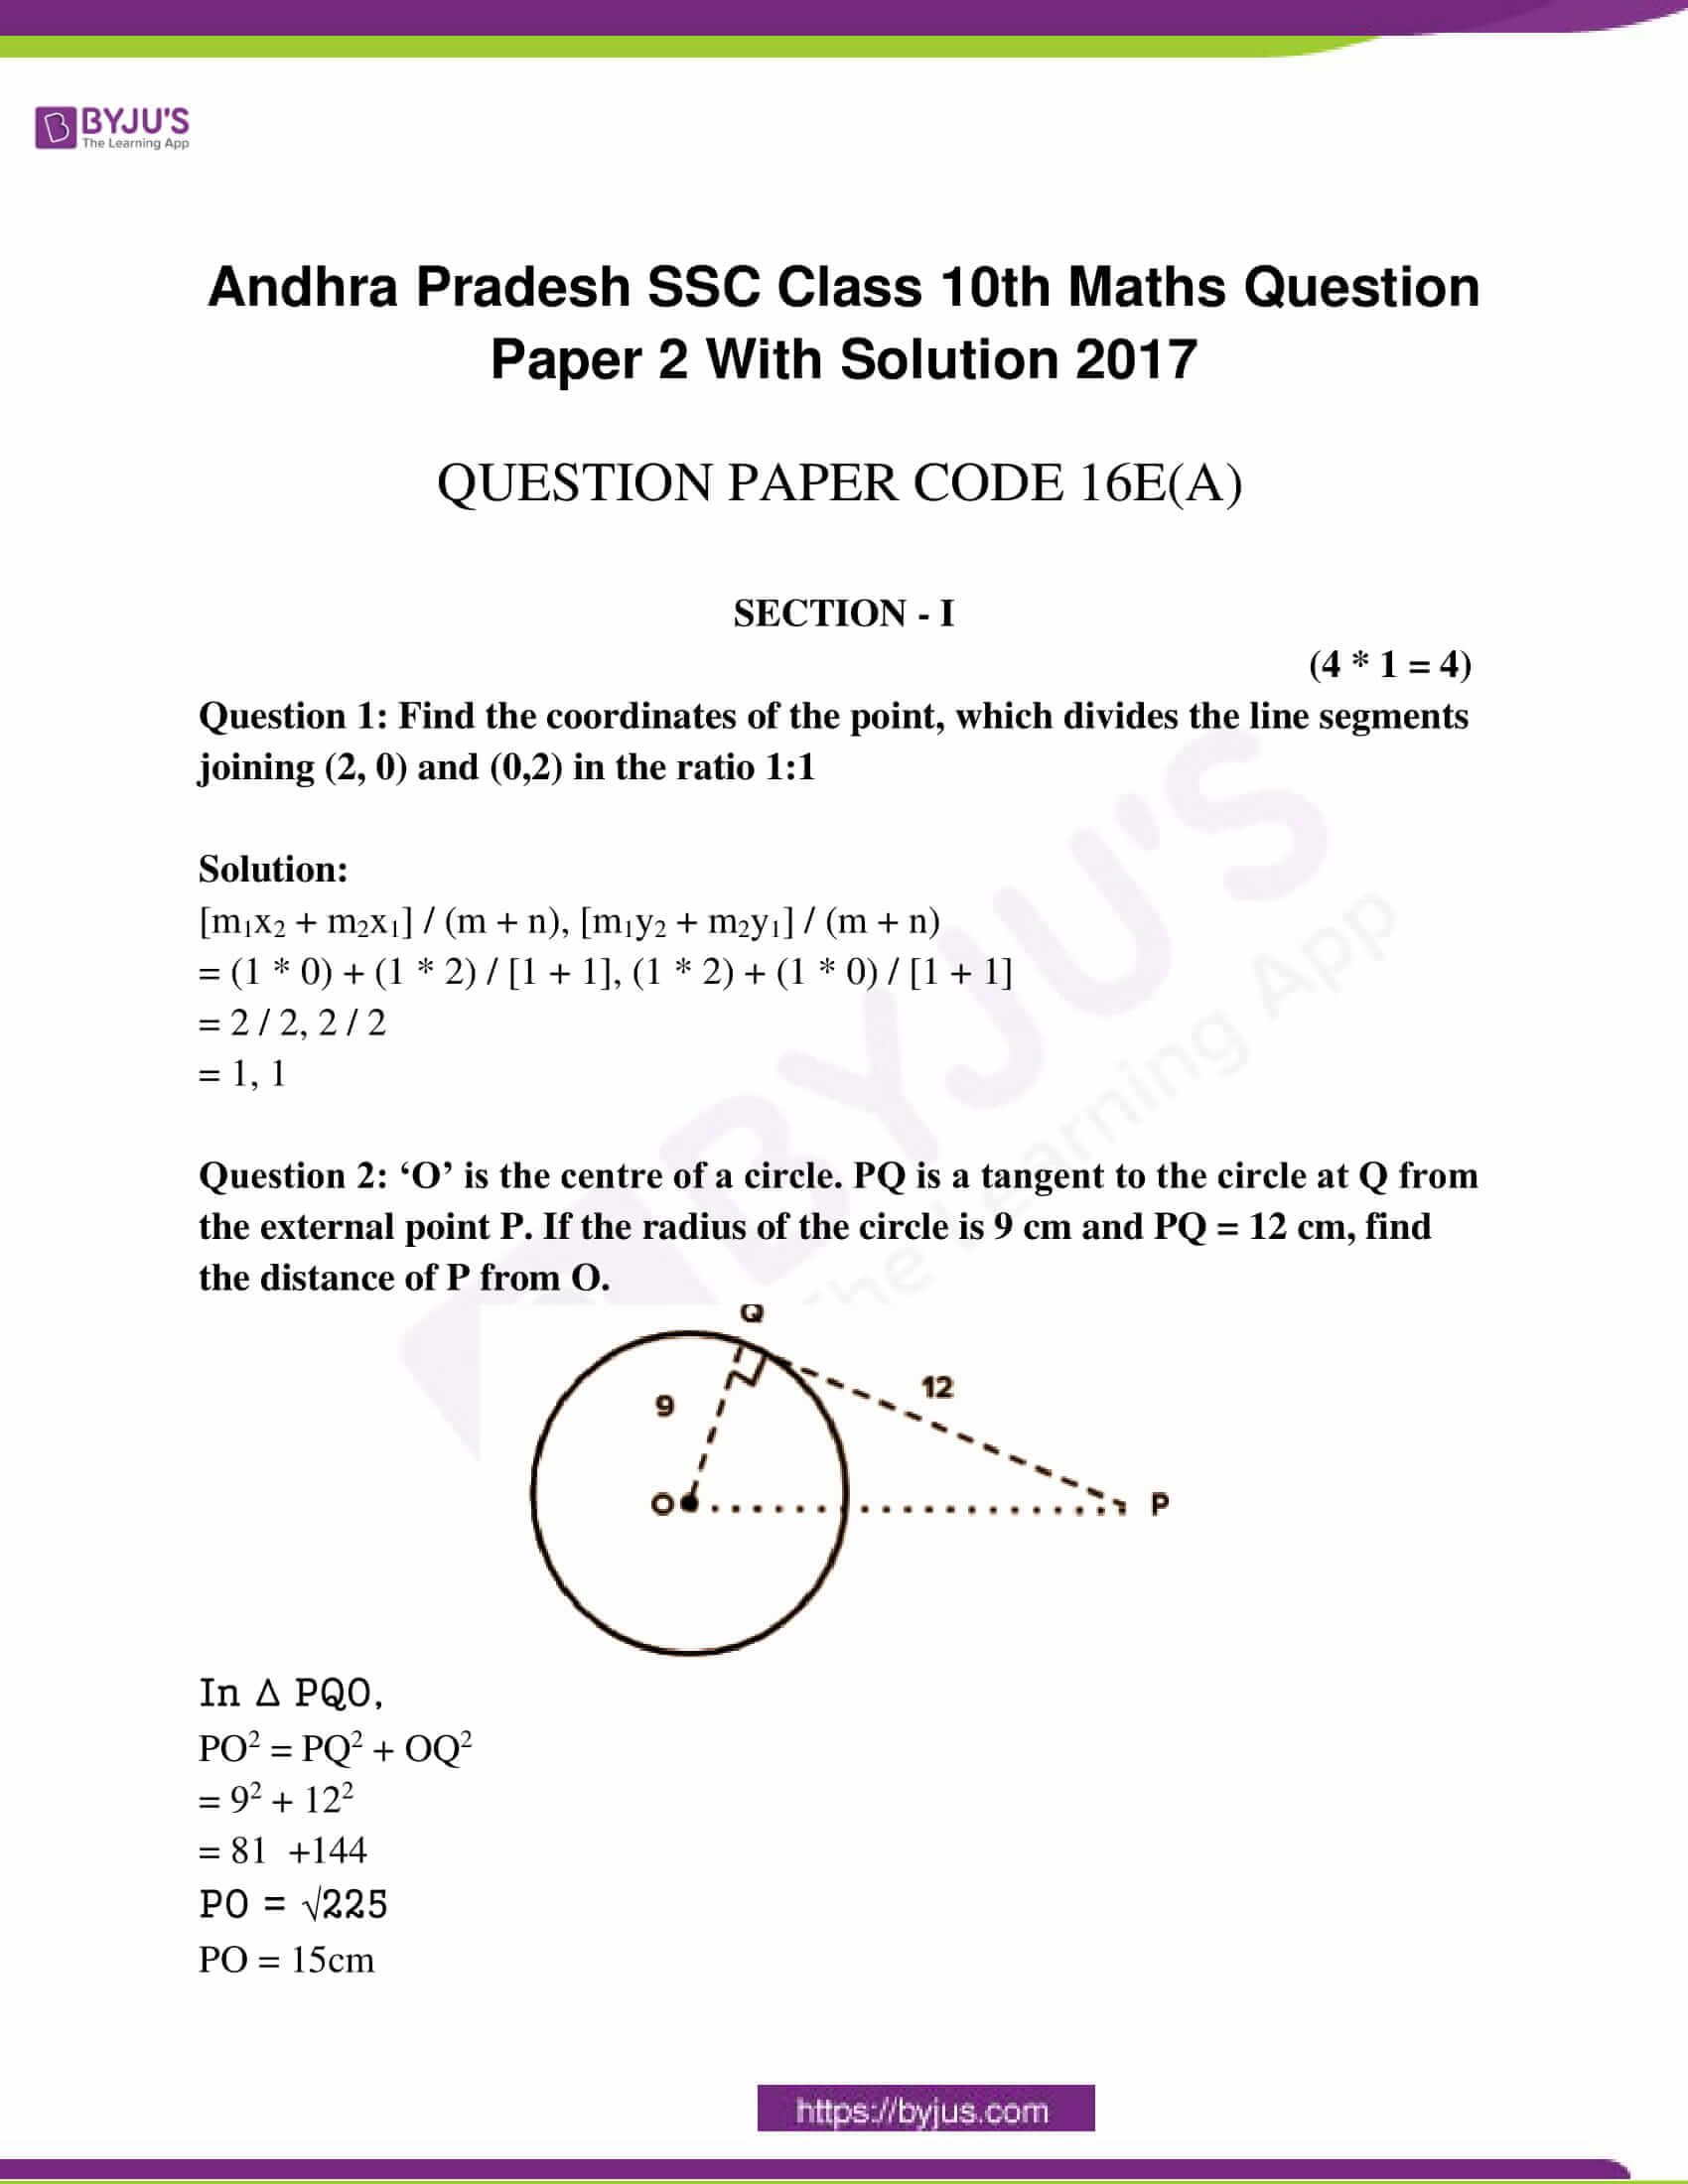 ap class 10 maths question paper 2 sol march 2017 01